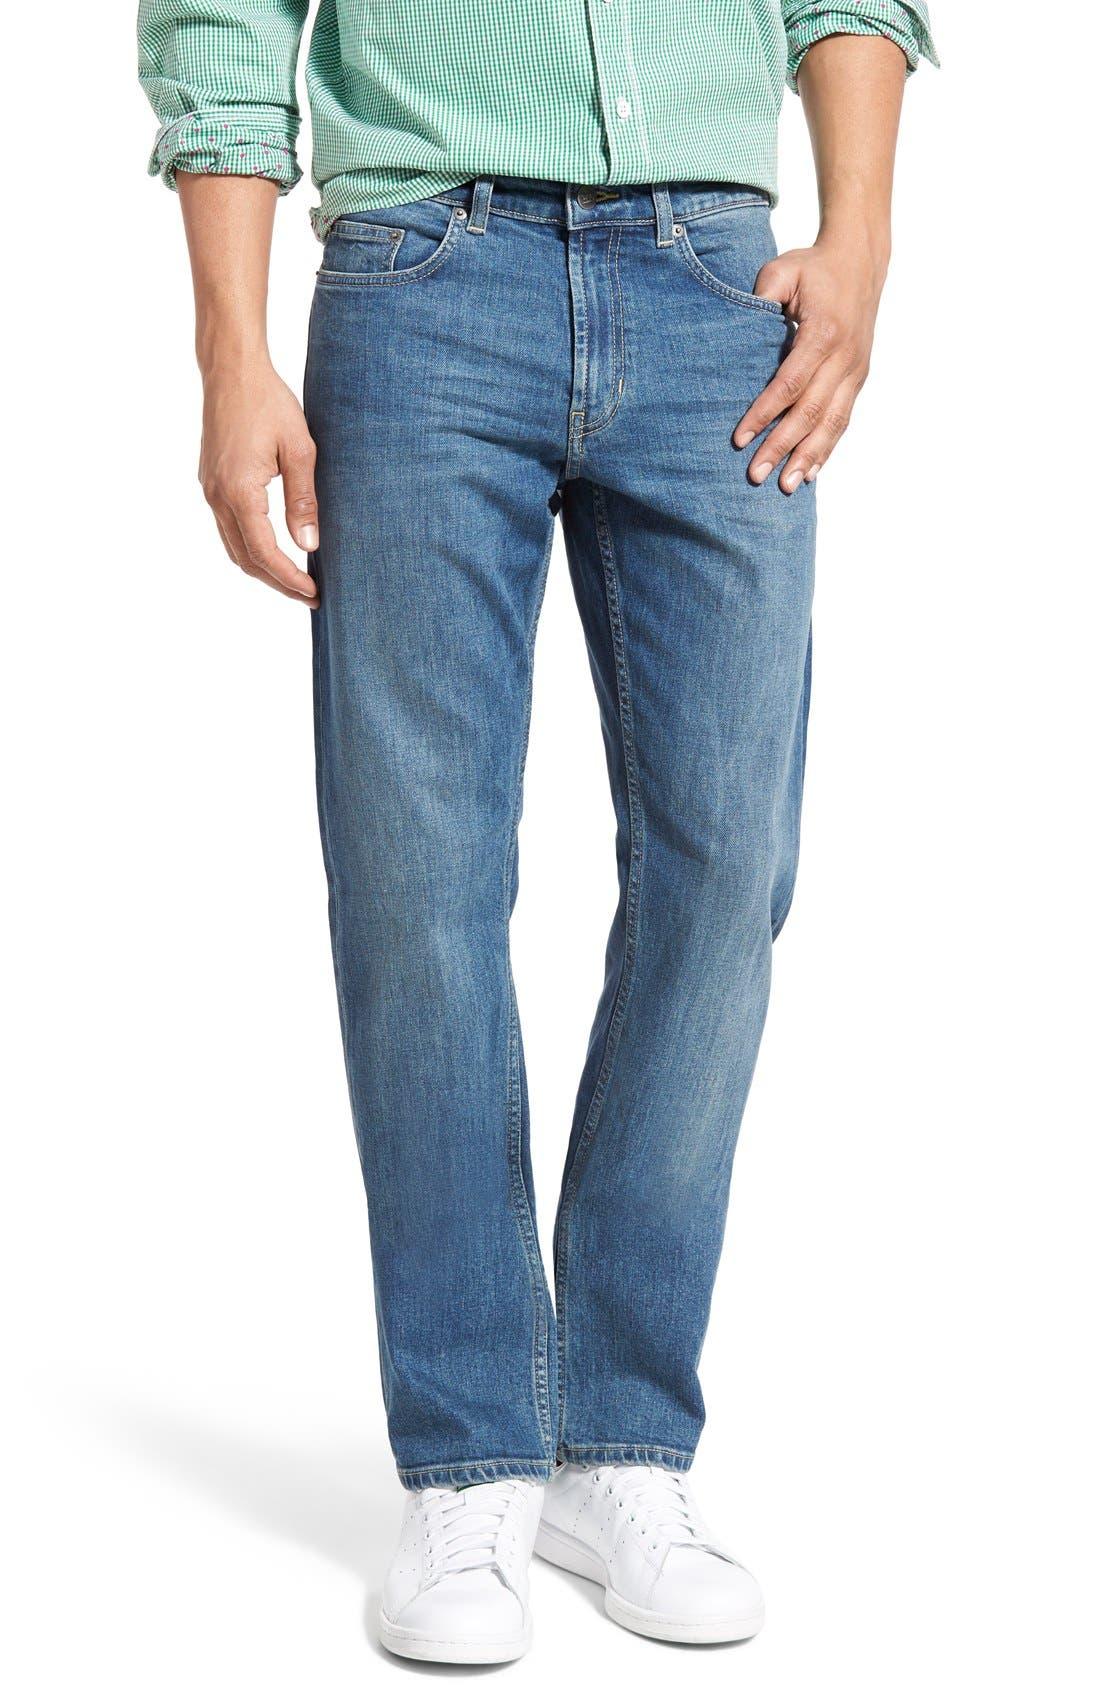 'Nicholls' Regular Fit Straight Leg Jeans,                             Main thumbnail 1, color,                             DENIM